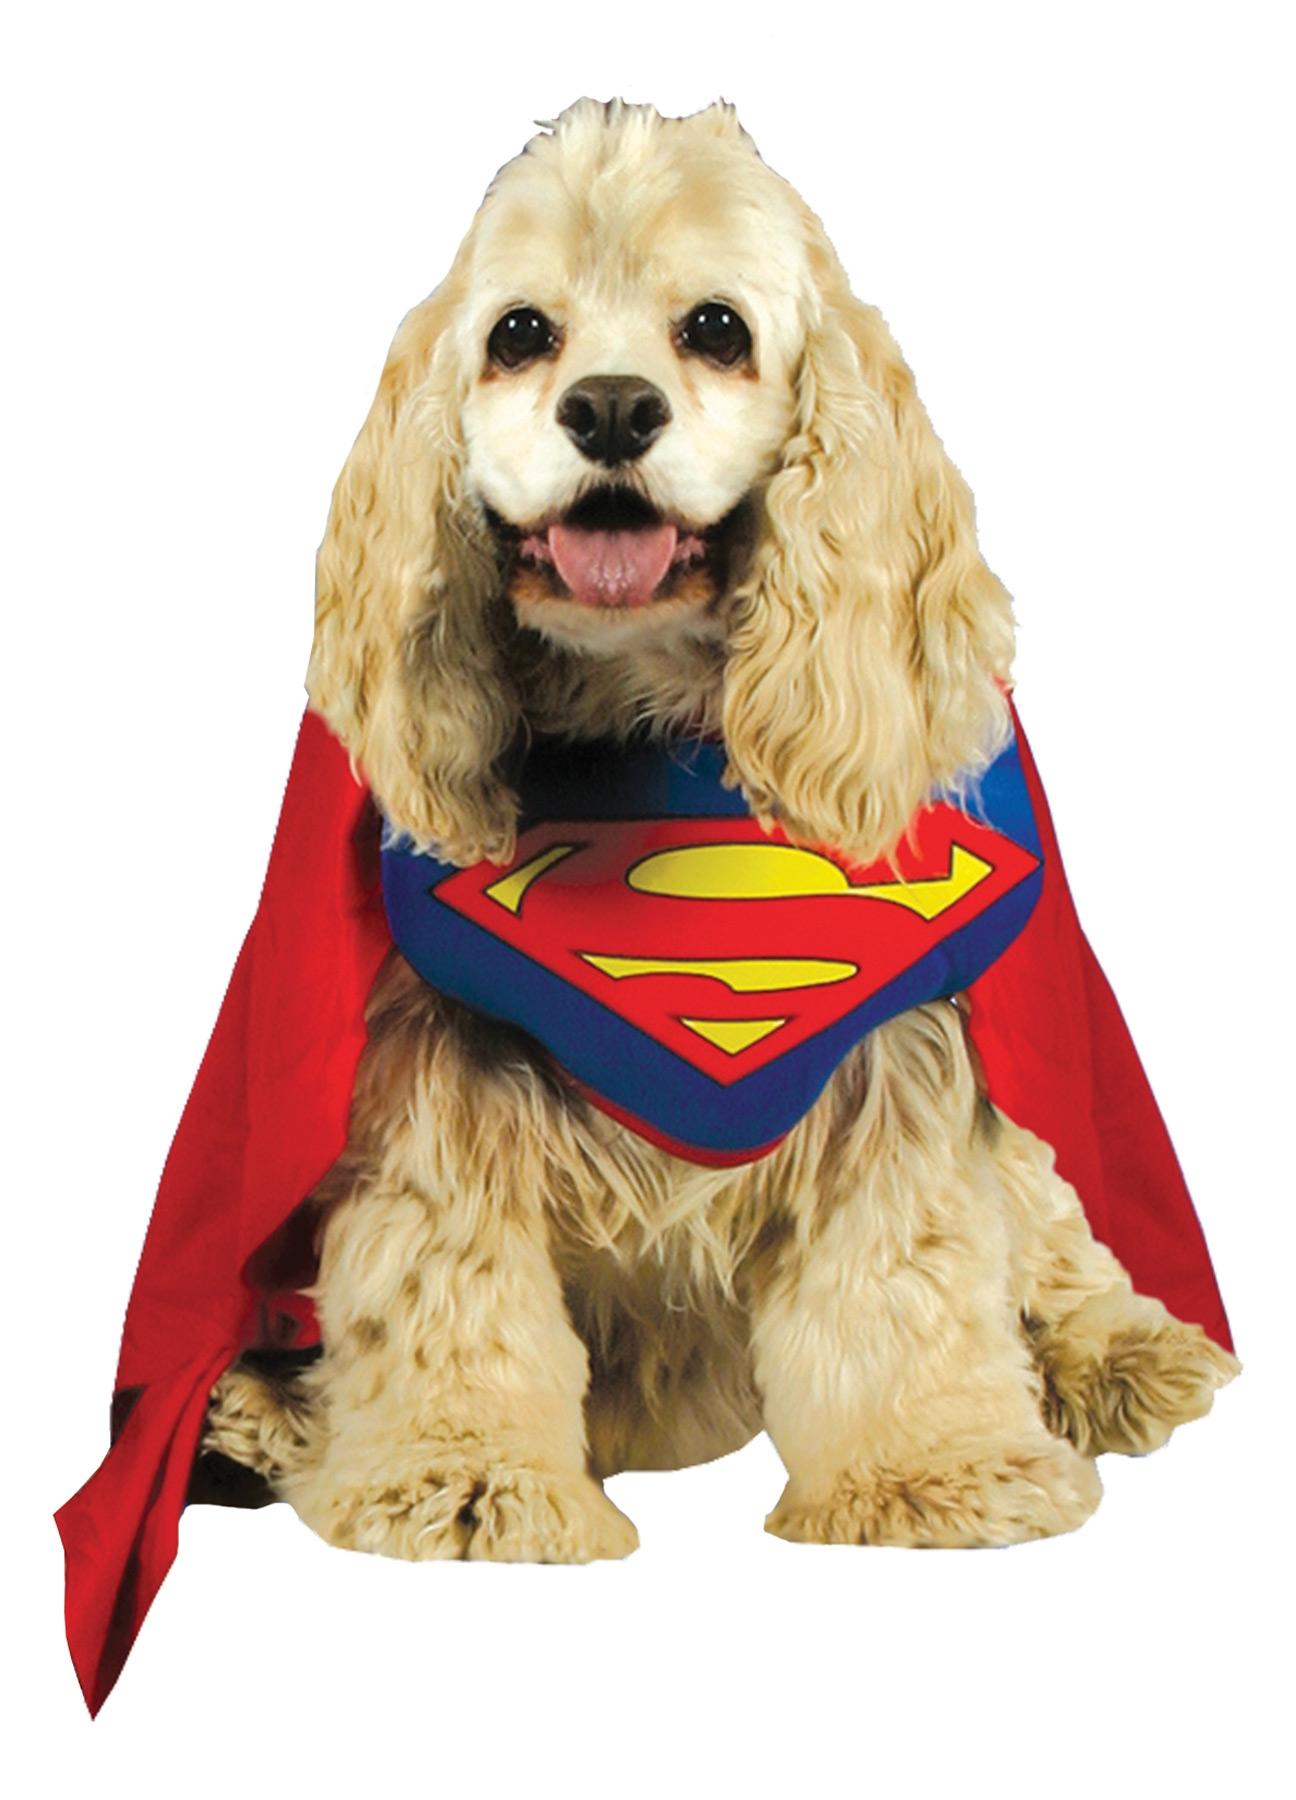 Костюм супермена для собаки (4-4) б у вольер для собаки в кемерово